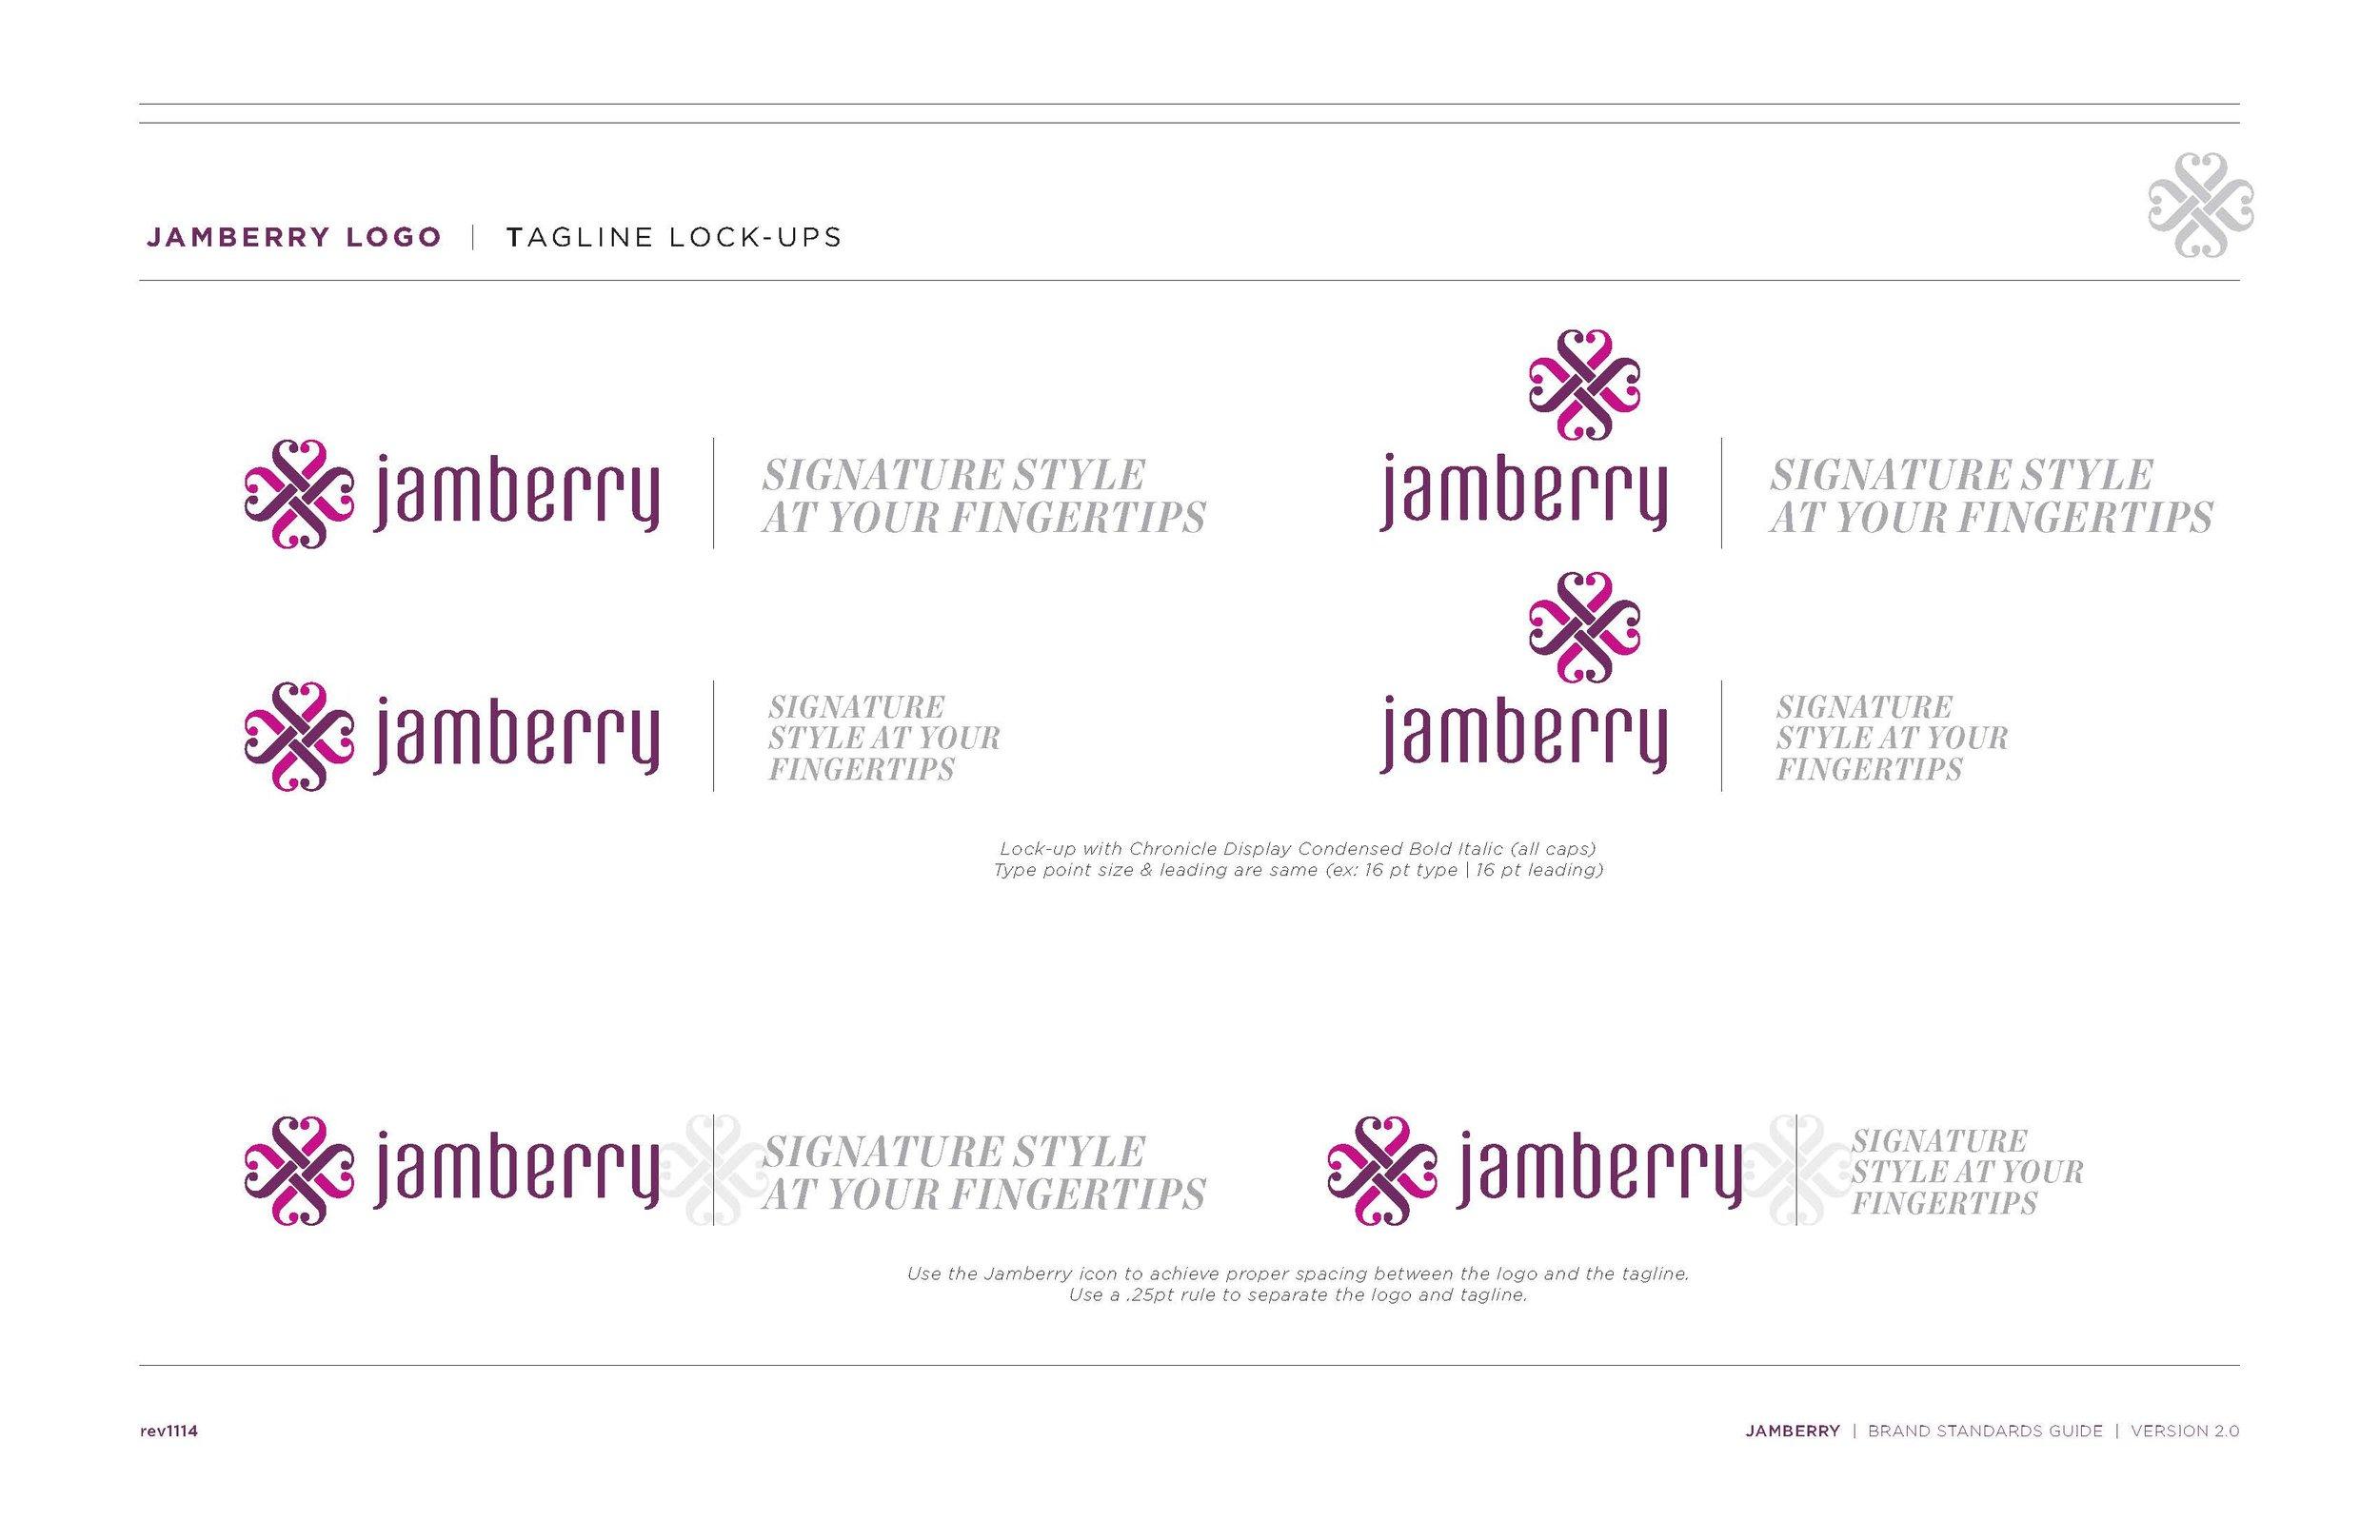 Jamberry GSG_v2.0_Page_08.jpg